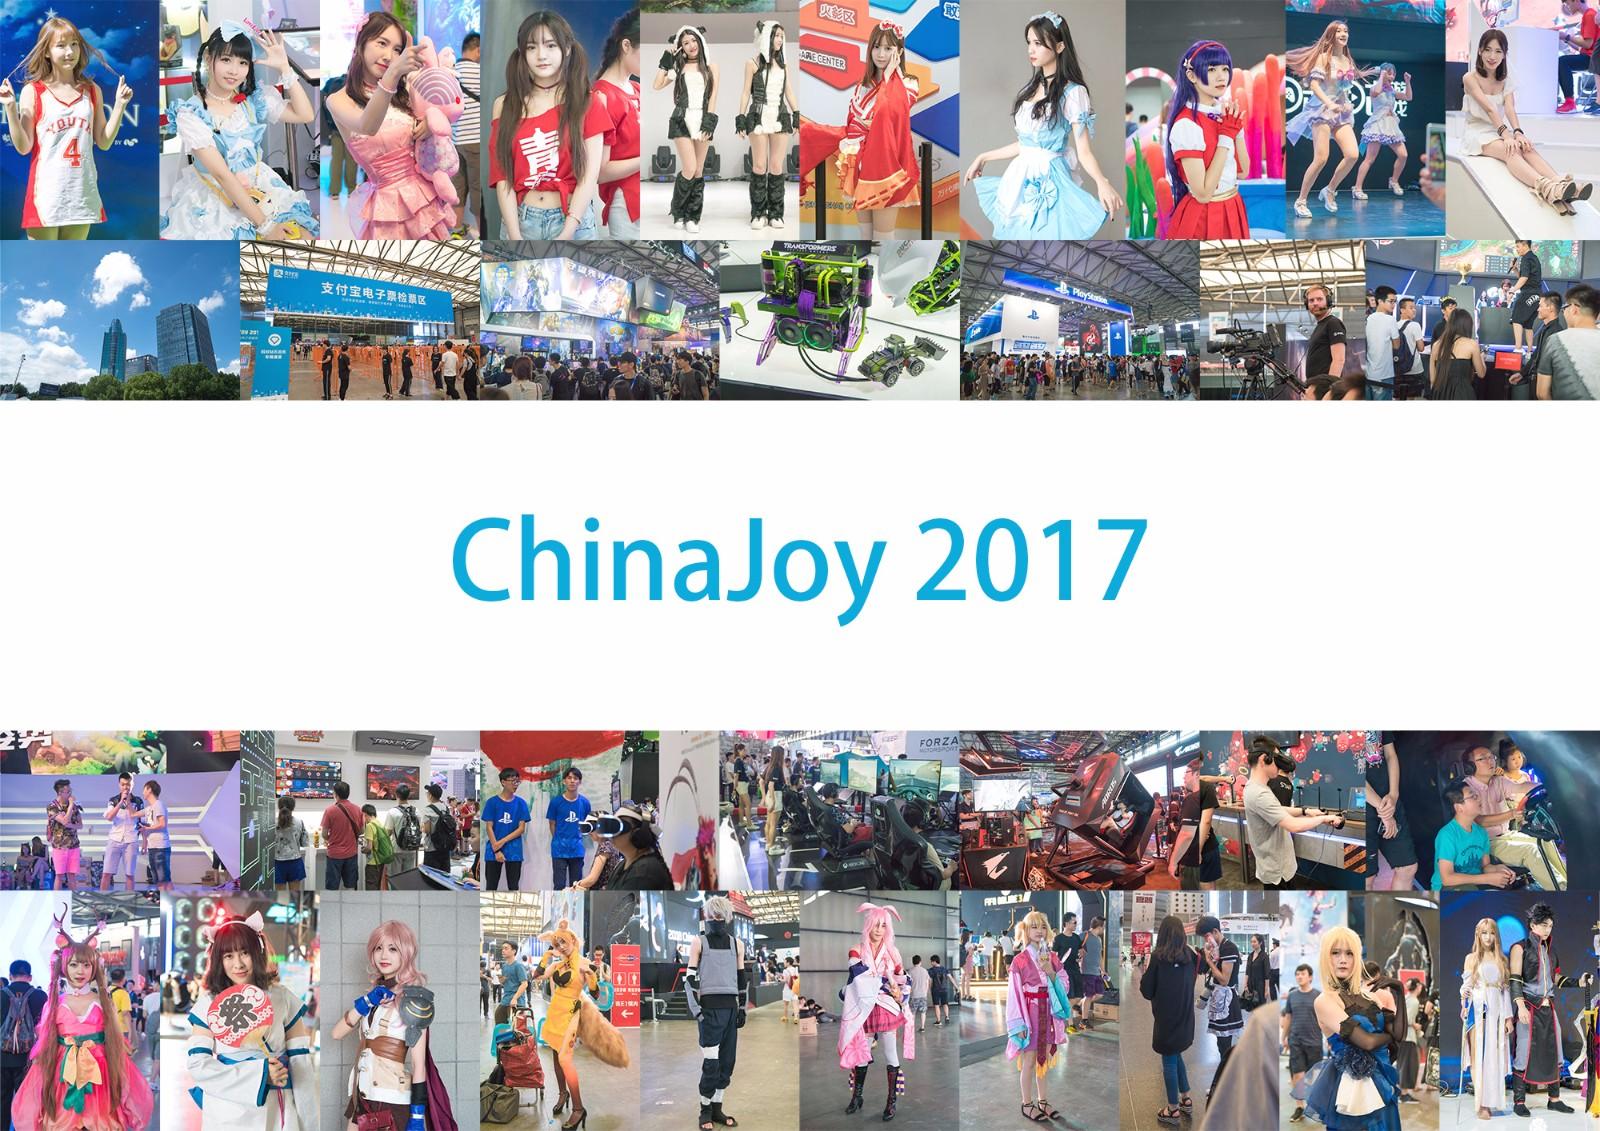 ChinaJoy 2017 2.jpg